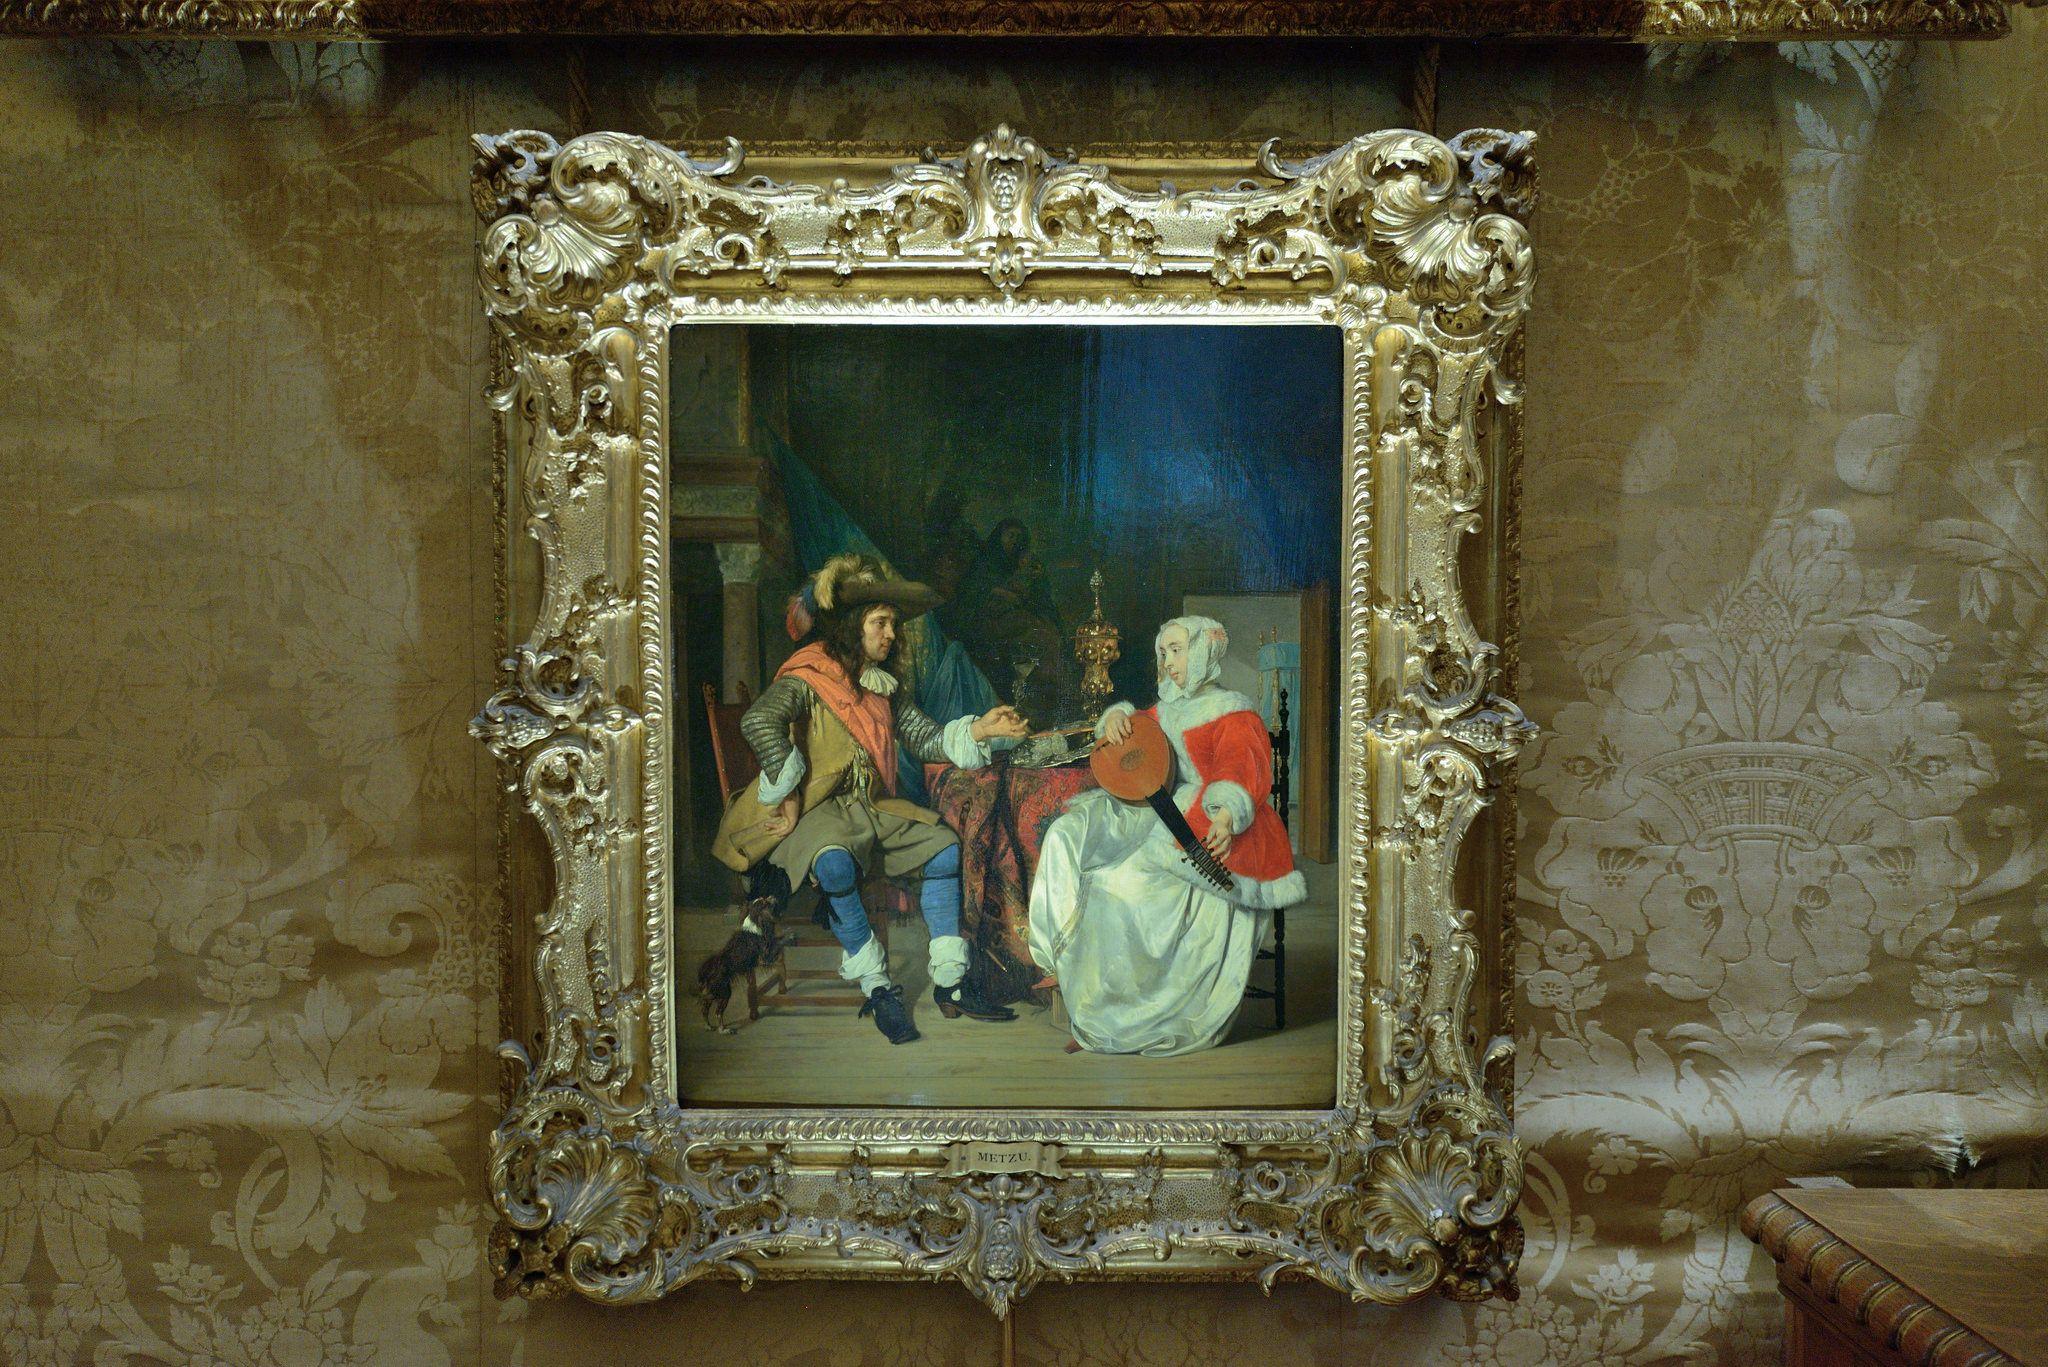 Waddesdon Manor-Buckinghamshire-Morning Room-painting of seated couple by Metzu